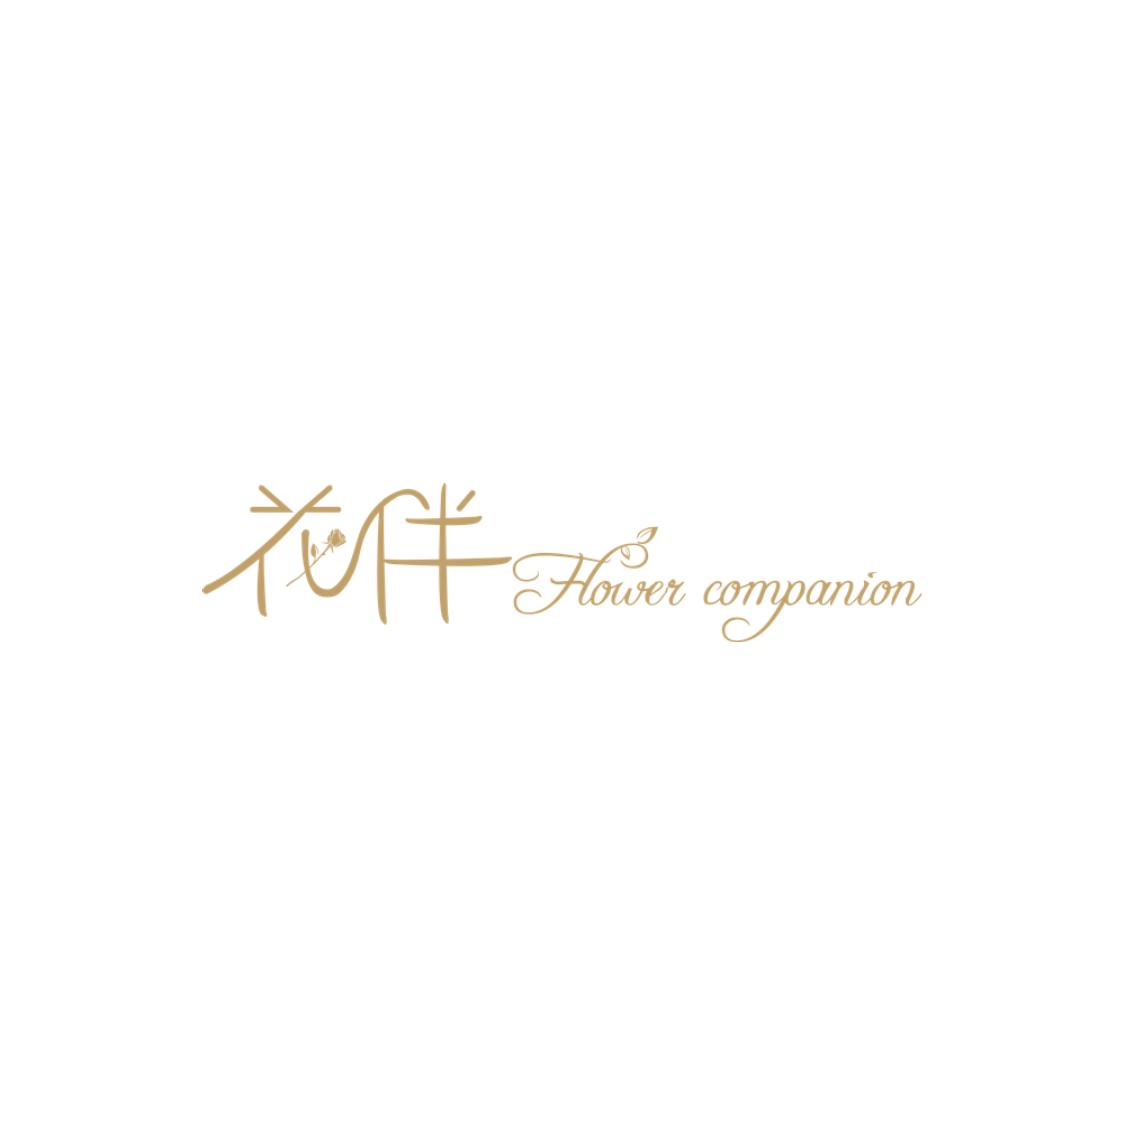 Flower companion花伴婚礼